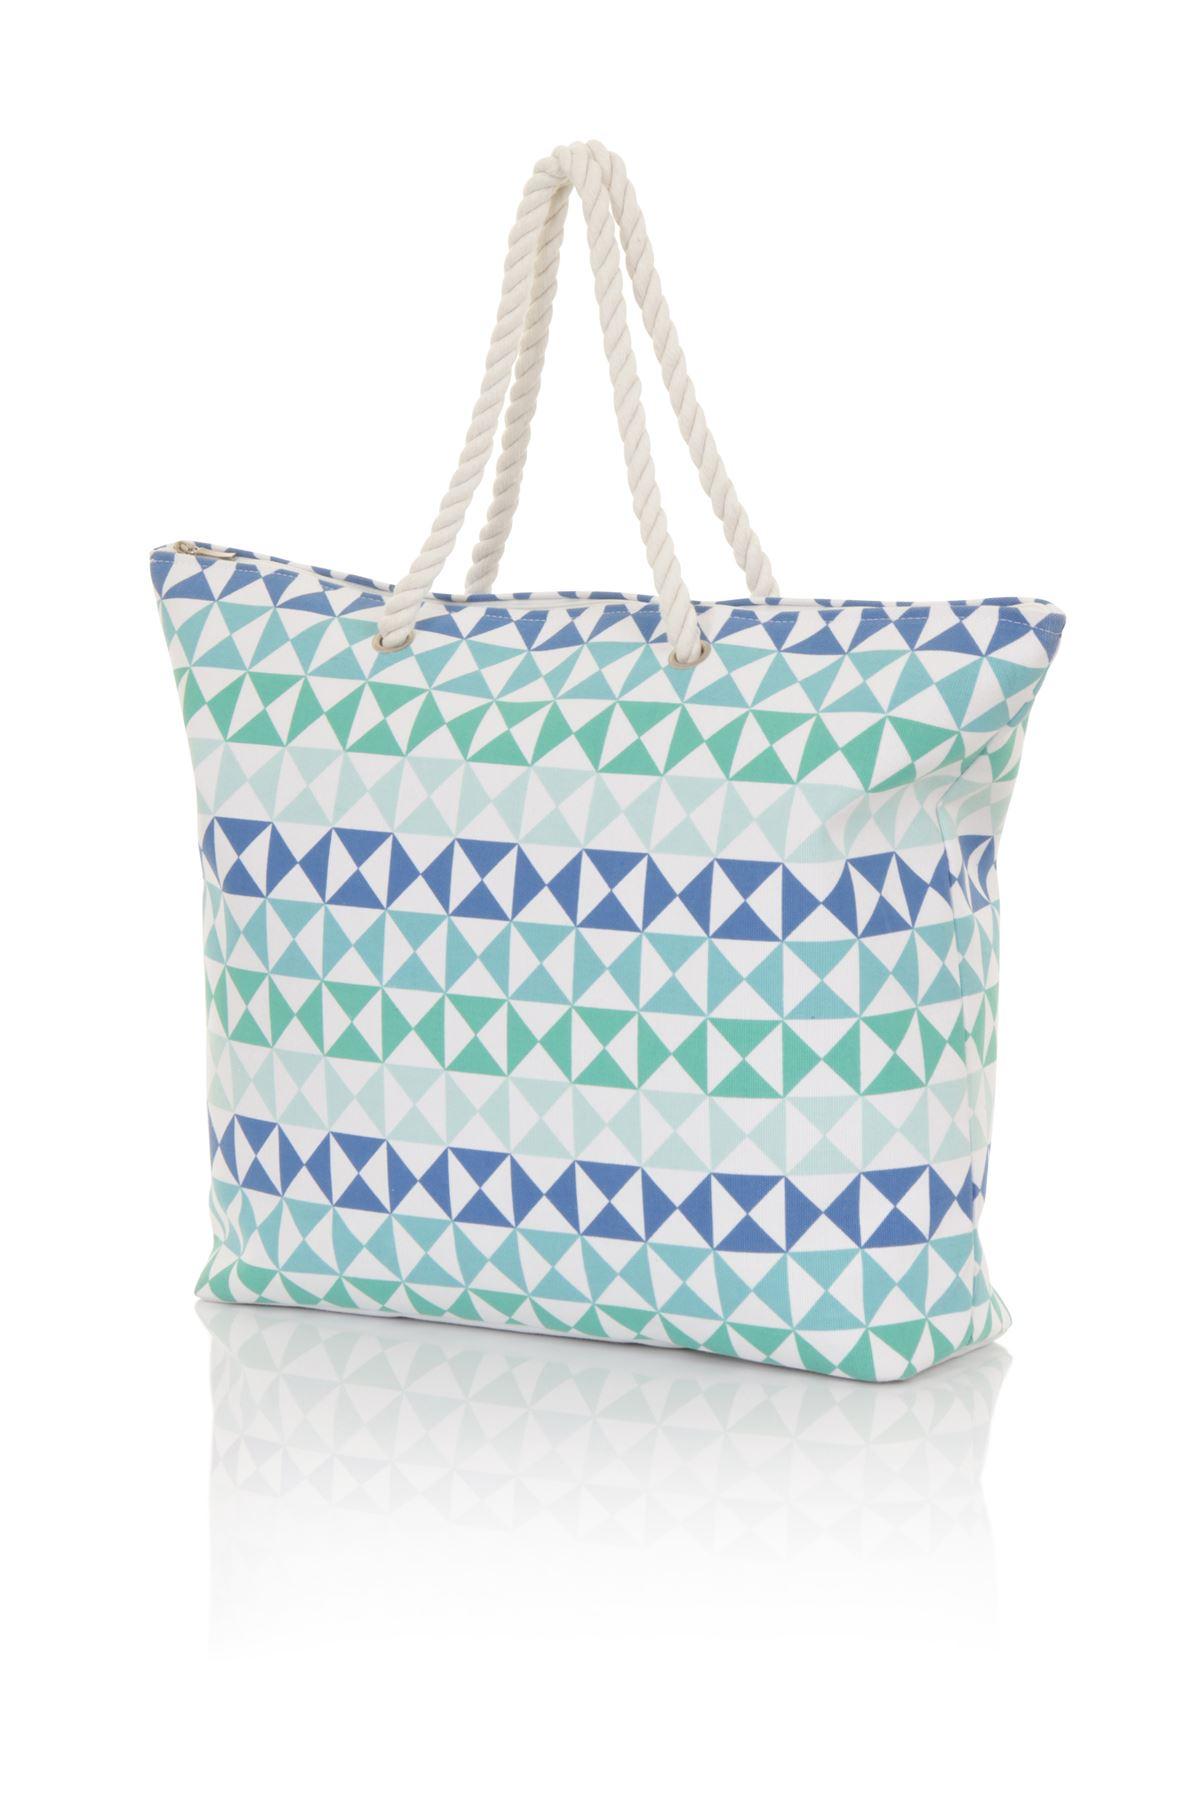 Ladies canvas beach sun summer shoulder holiday bag